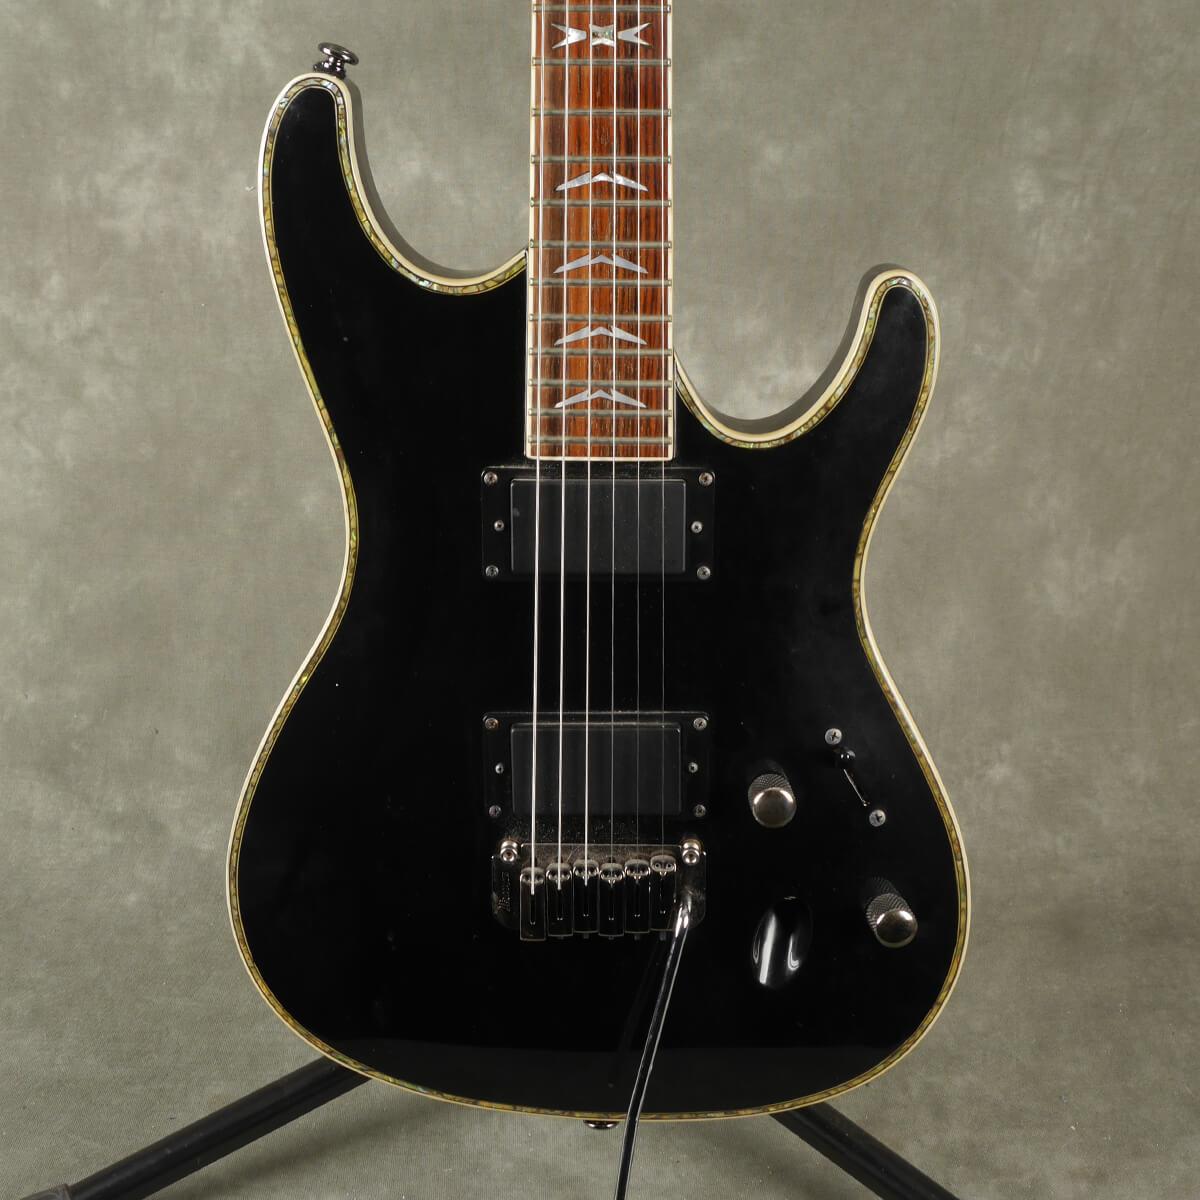 Ibanez SAS32EX-BK Electric Guitar - Black - 2nd Hand